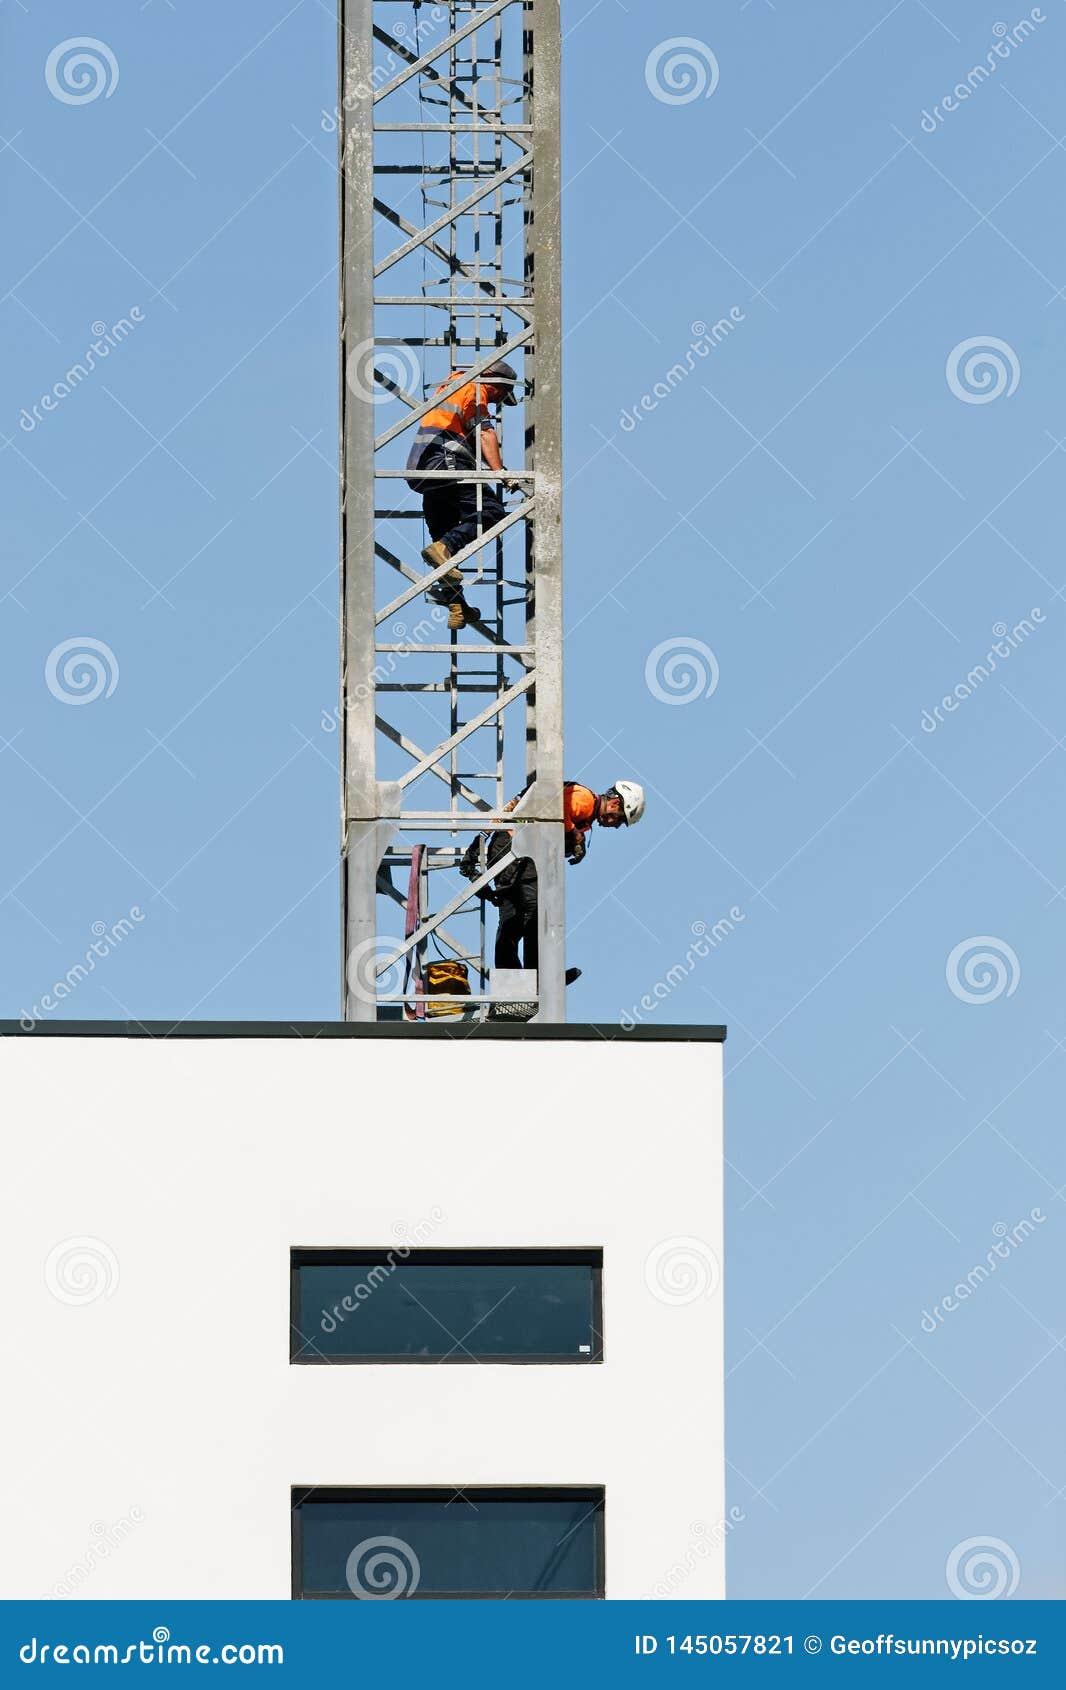 Construction crane removal. Update ed323. Gosford. April 9, 2019